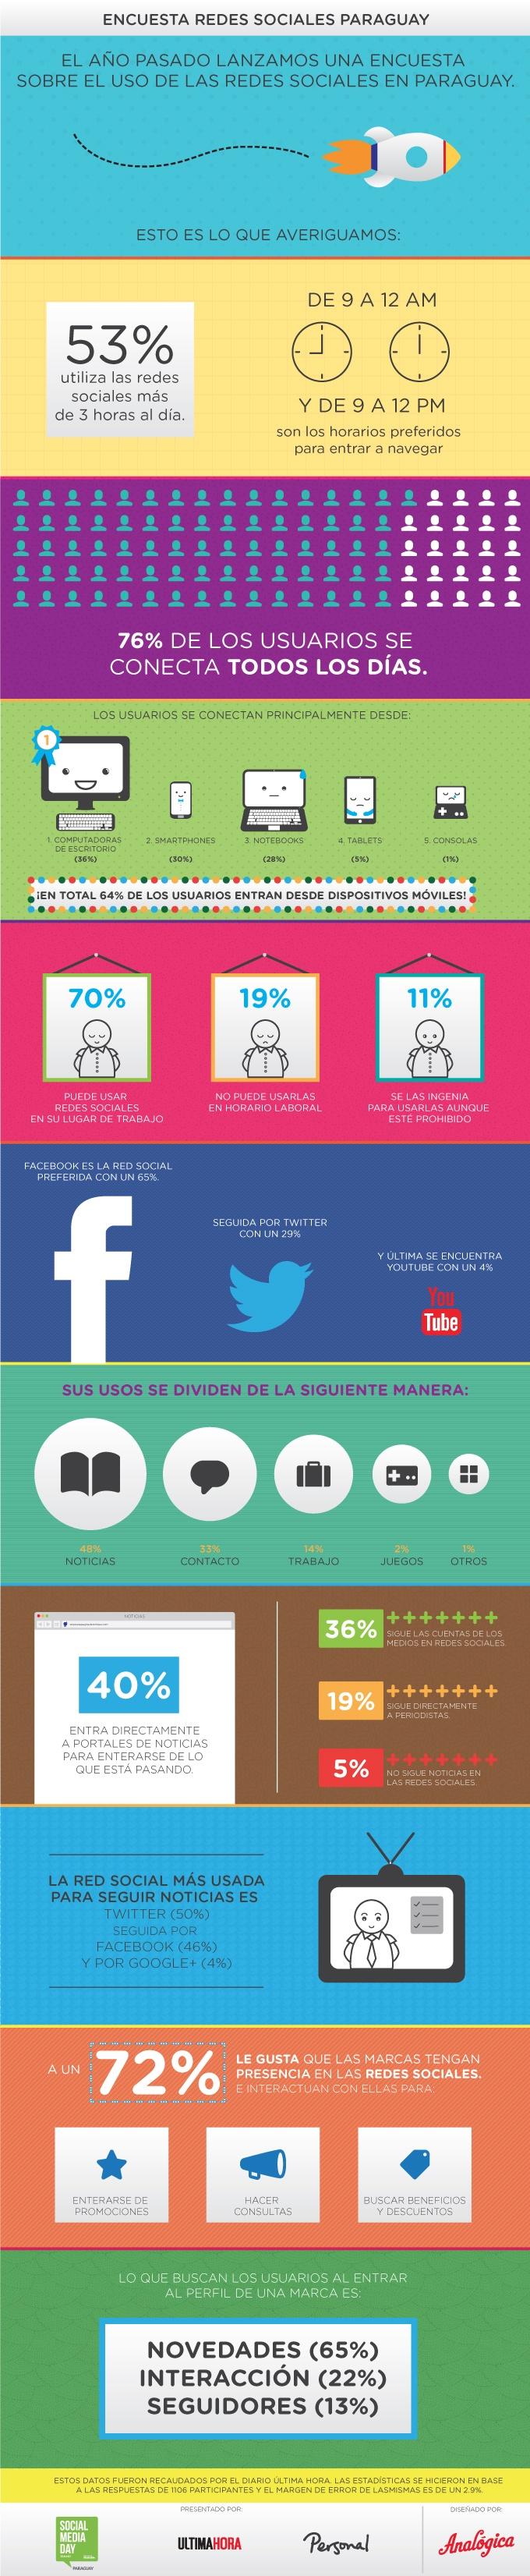 Redes Sociales en Paraguay #infografia #infographic #socialmedia